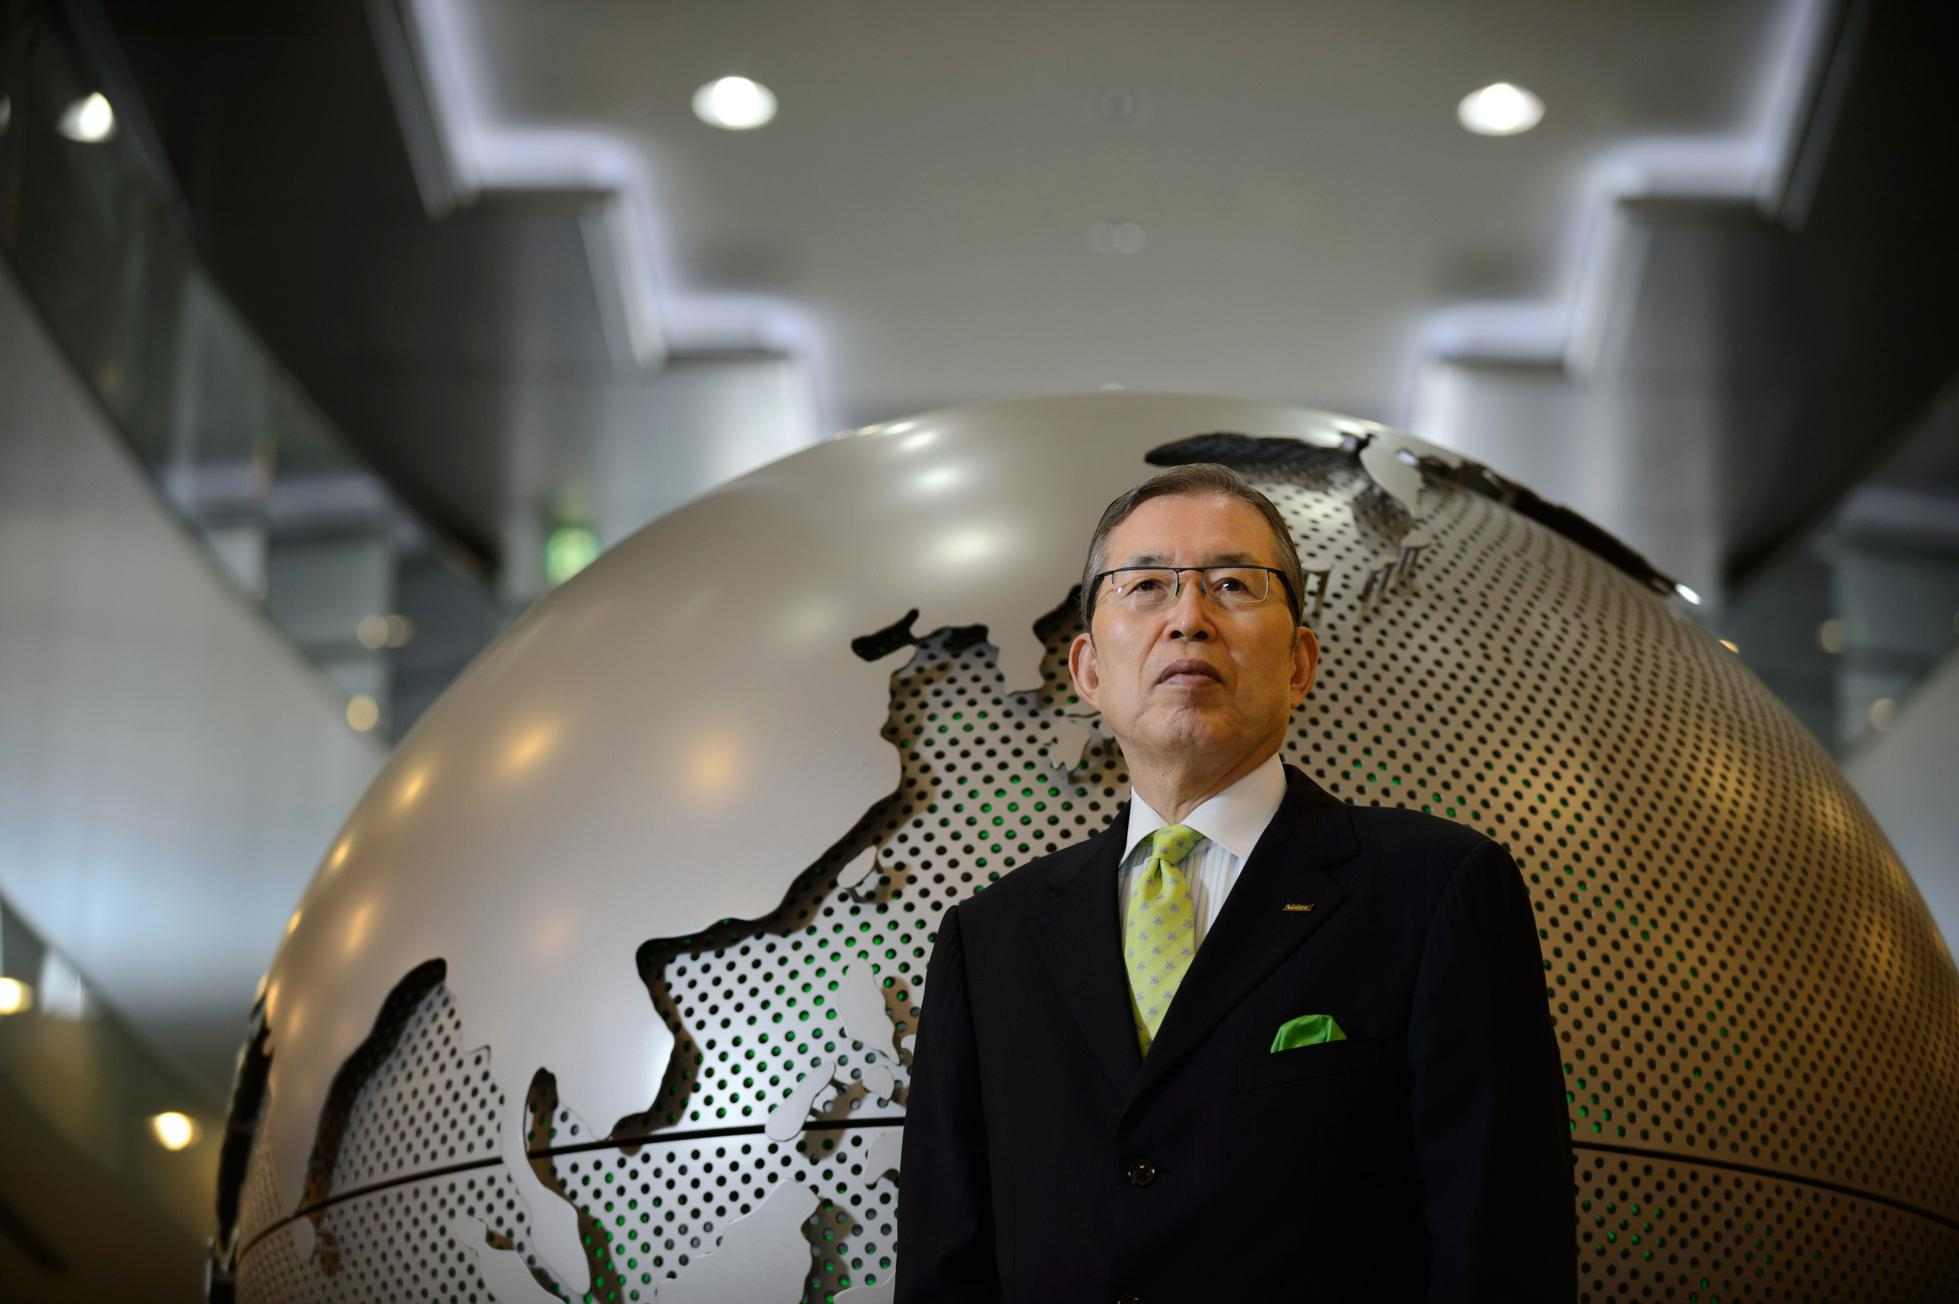 Nidec Corp. Founder Shigenobu Nagamori